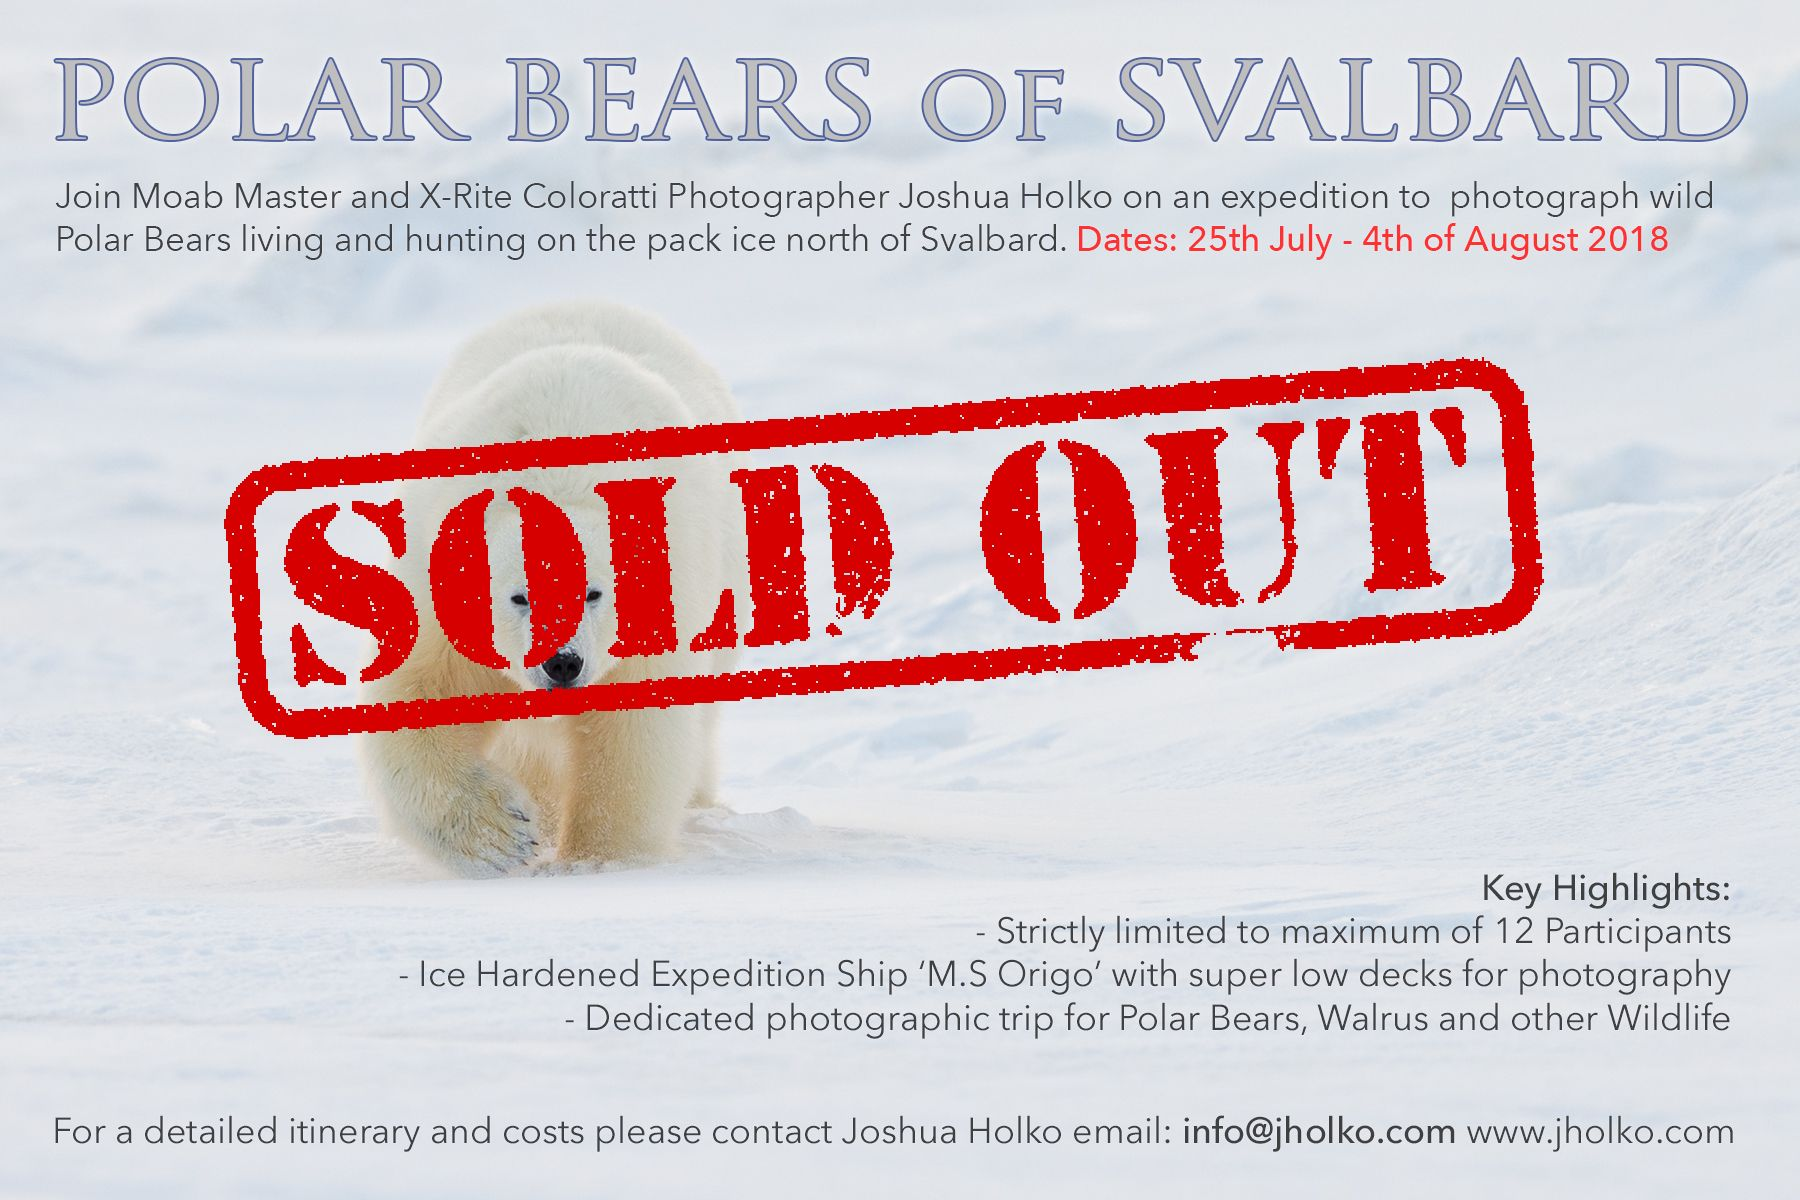 polarbear-svalbard-holko.jpg